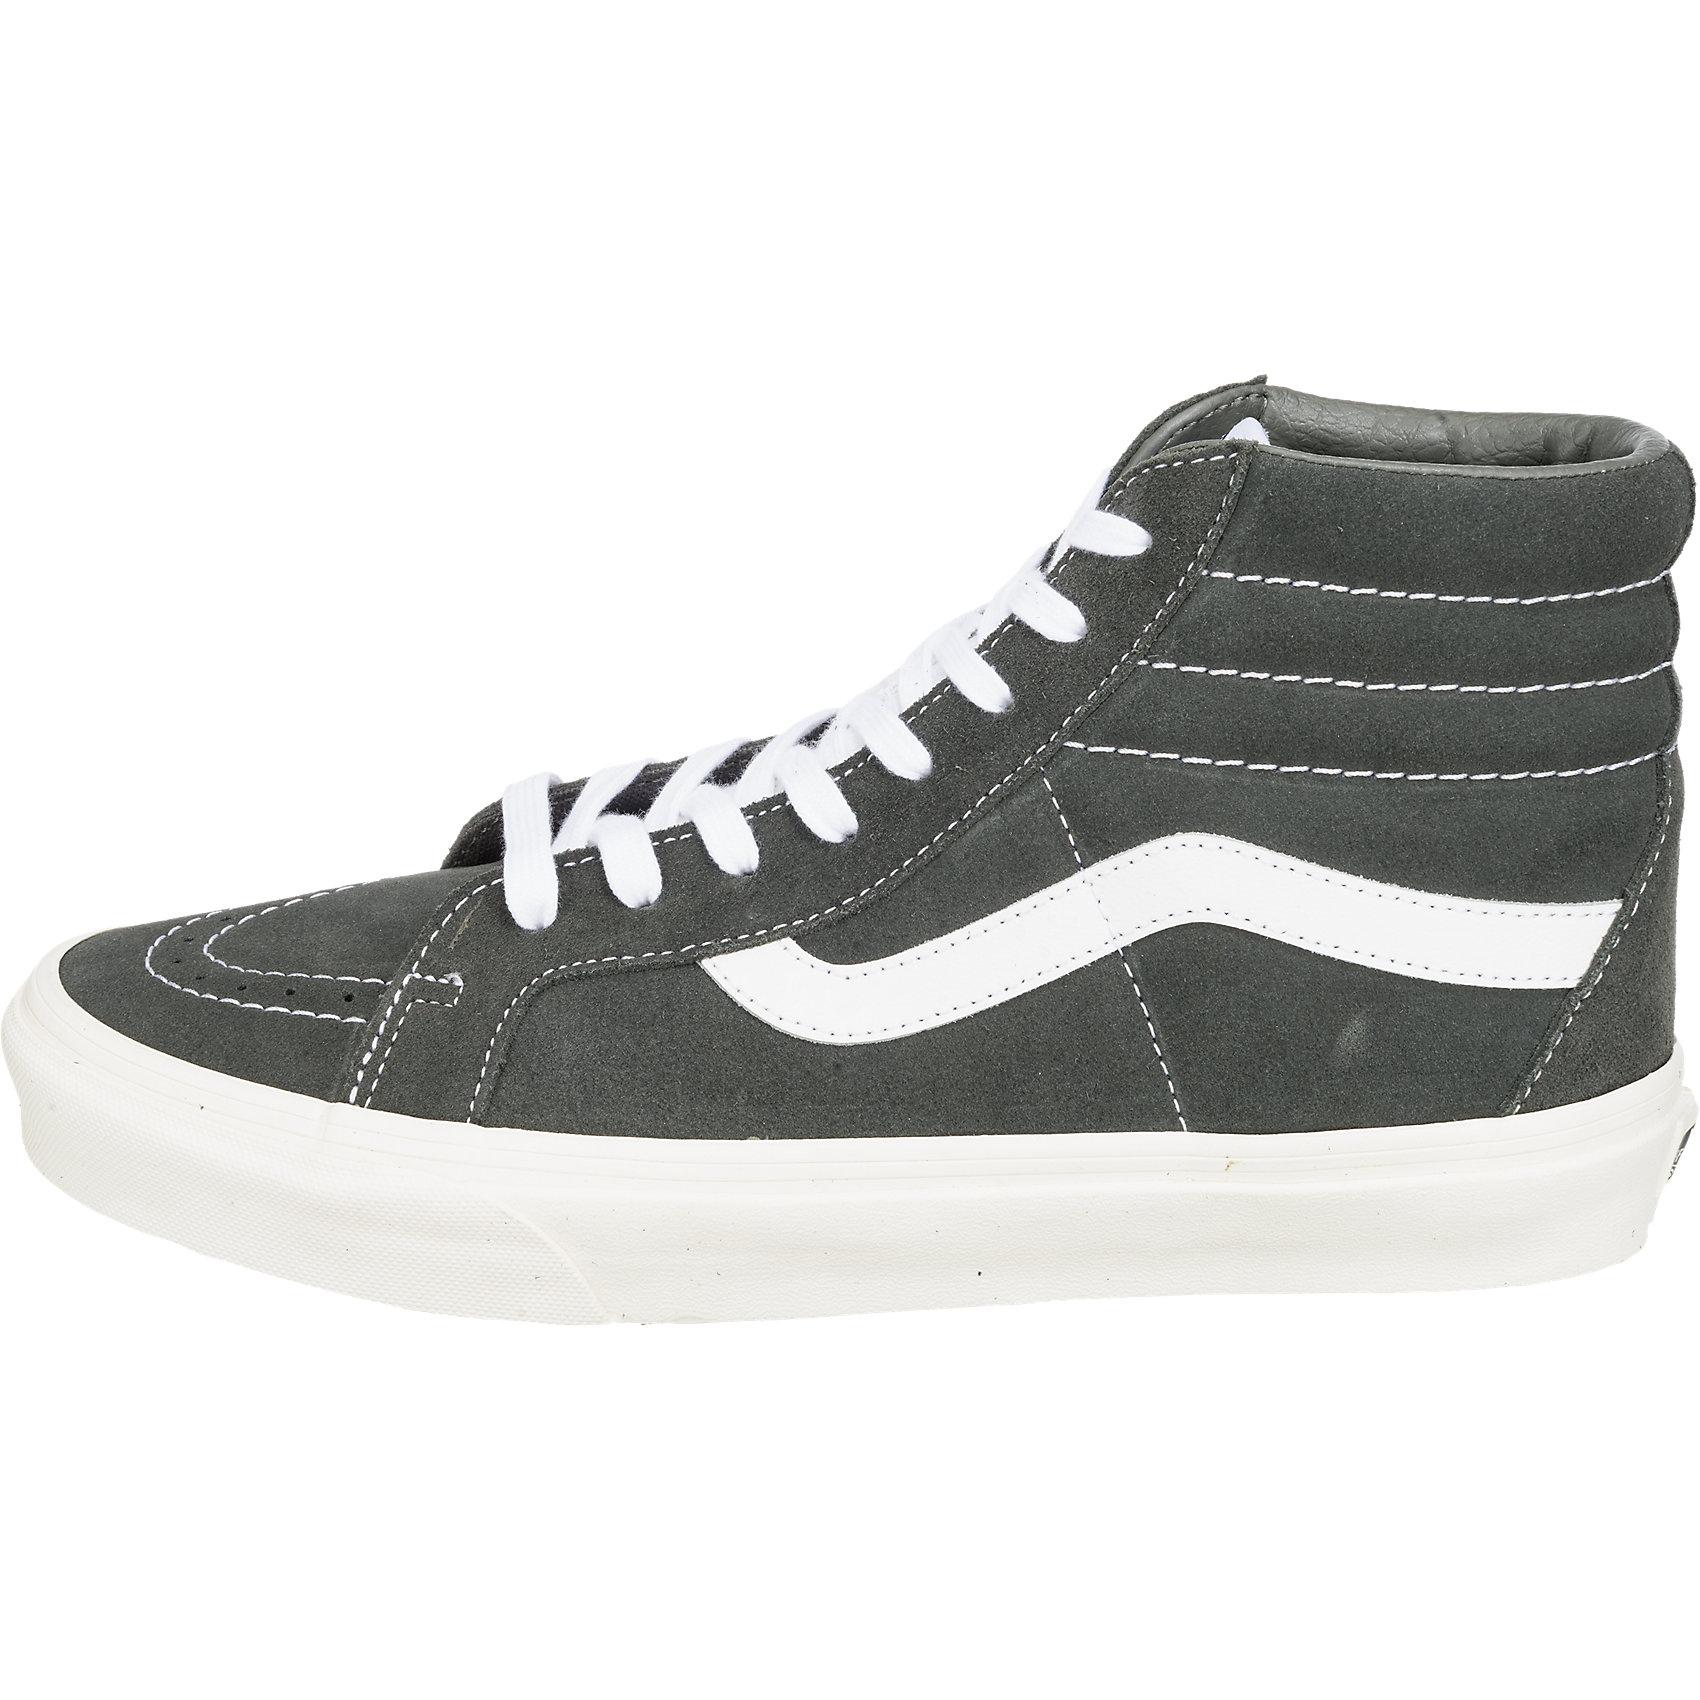 new arrival 70708 40b6d Details zu Neu VANS Sk8-Hi Reissue Sneakers grau 5773870